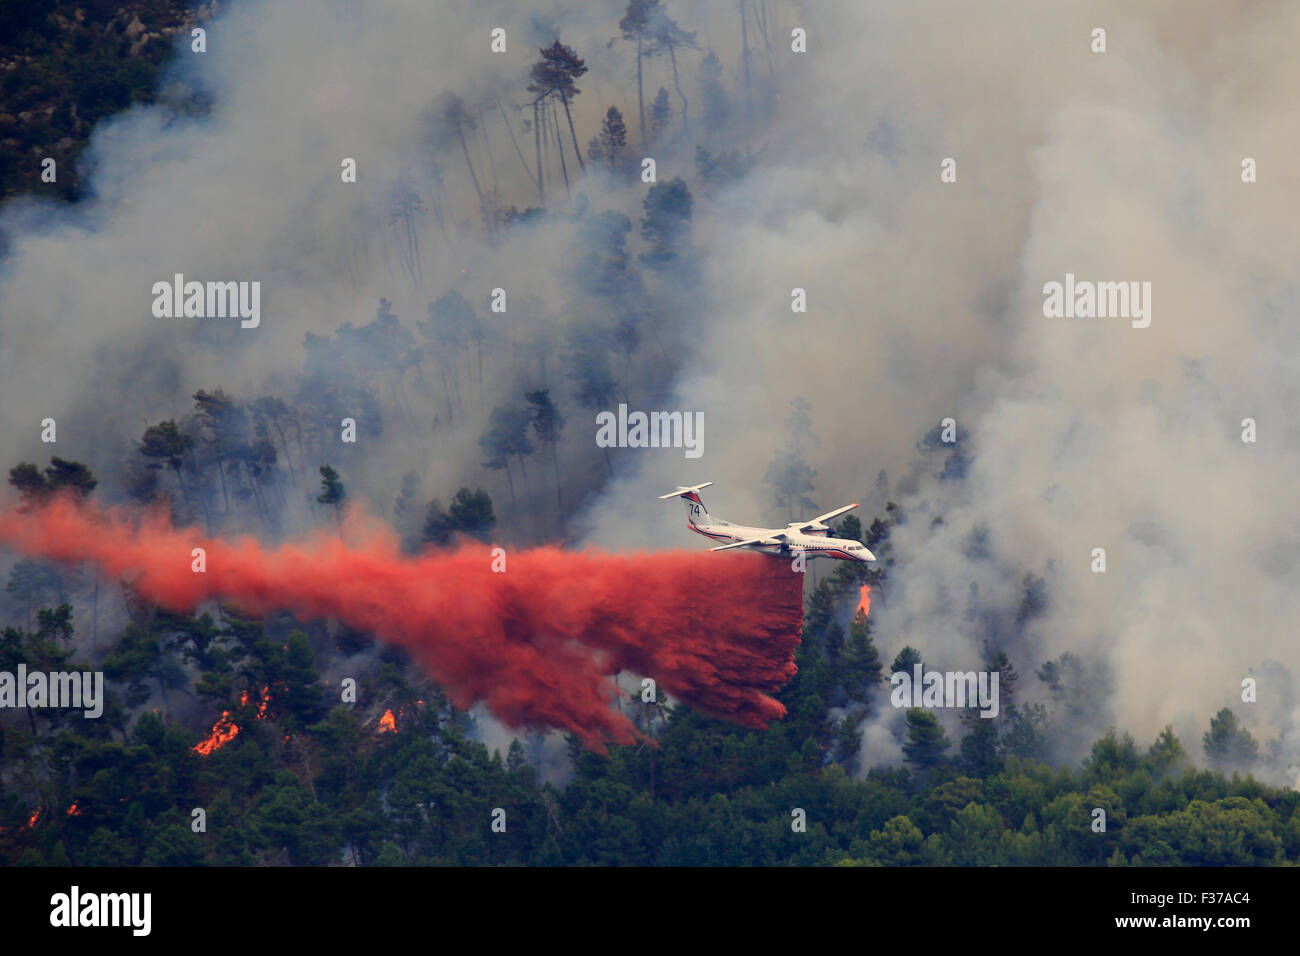 Fire extinction, firefighting aircraft Dash 8 Q400 MR, French Sécurité Civile, dropping extinguishing - Stock Image